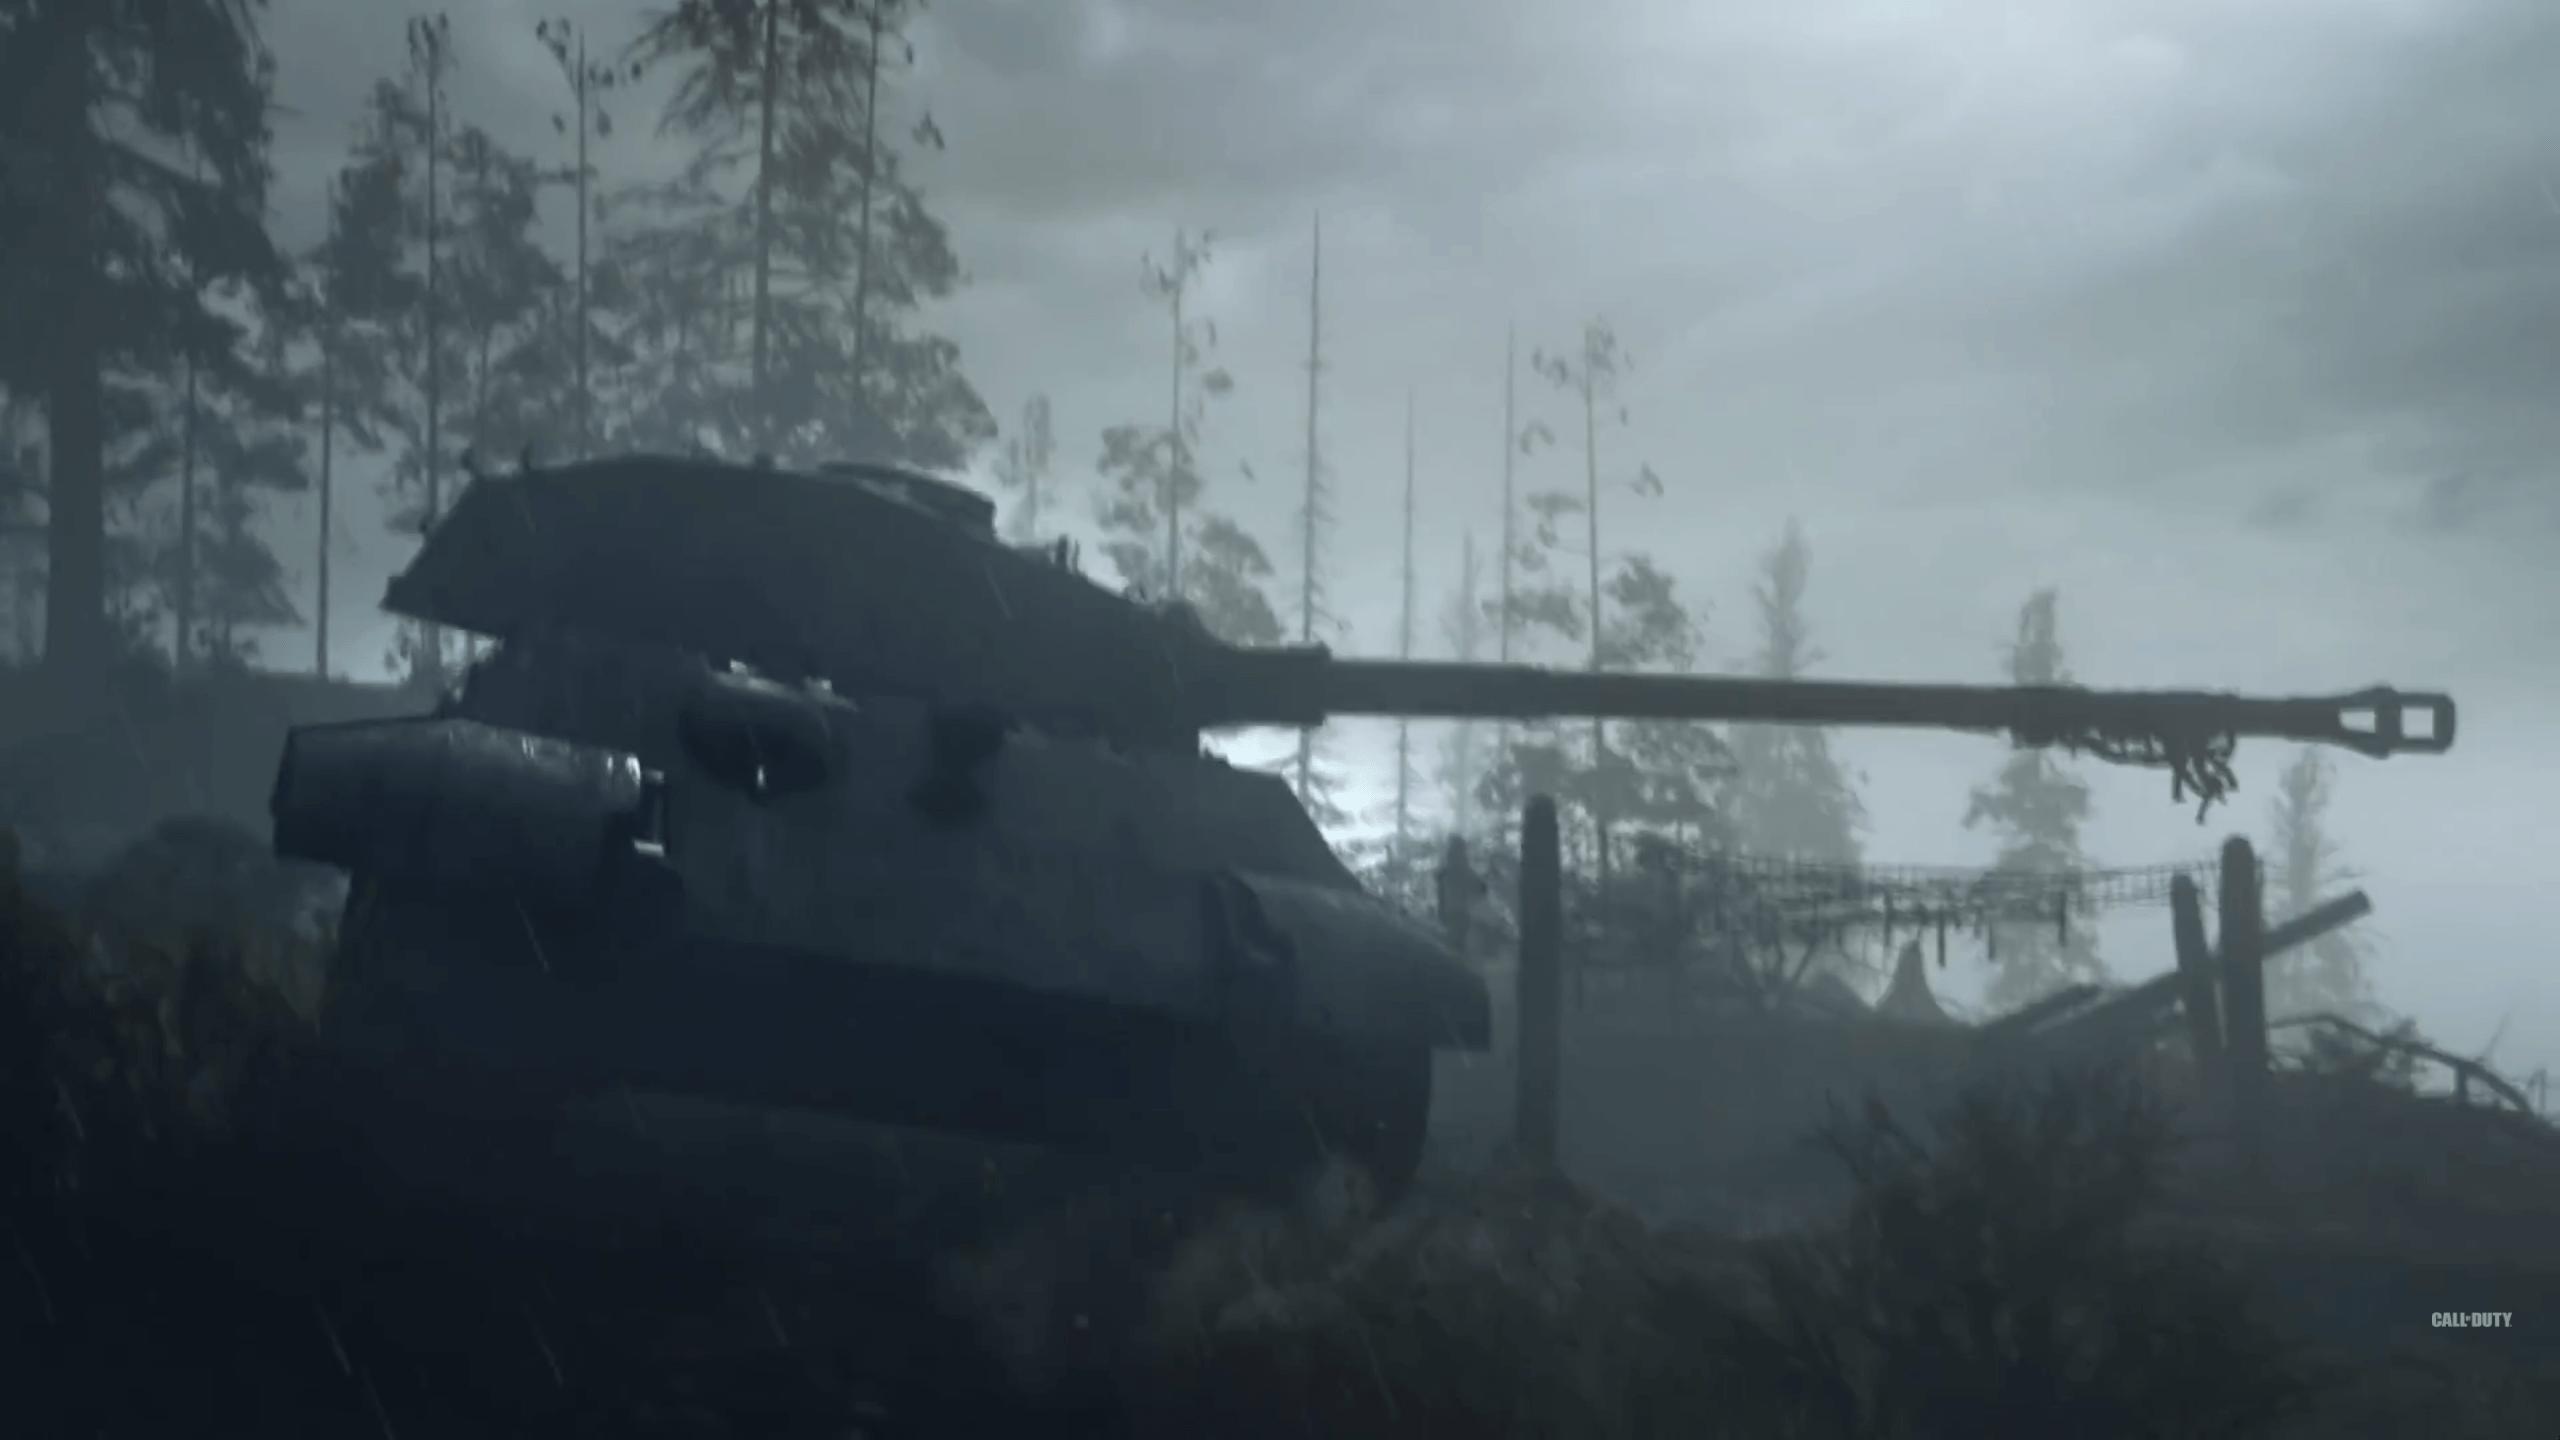 Call Of Duty Ww2 Wallpaper